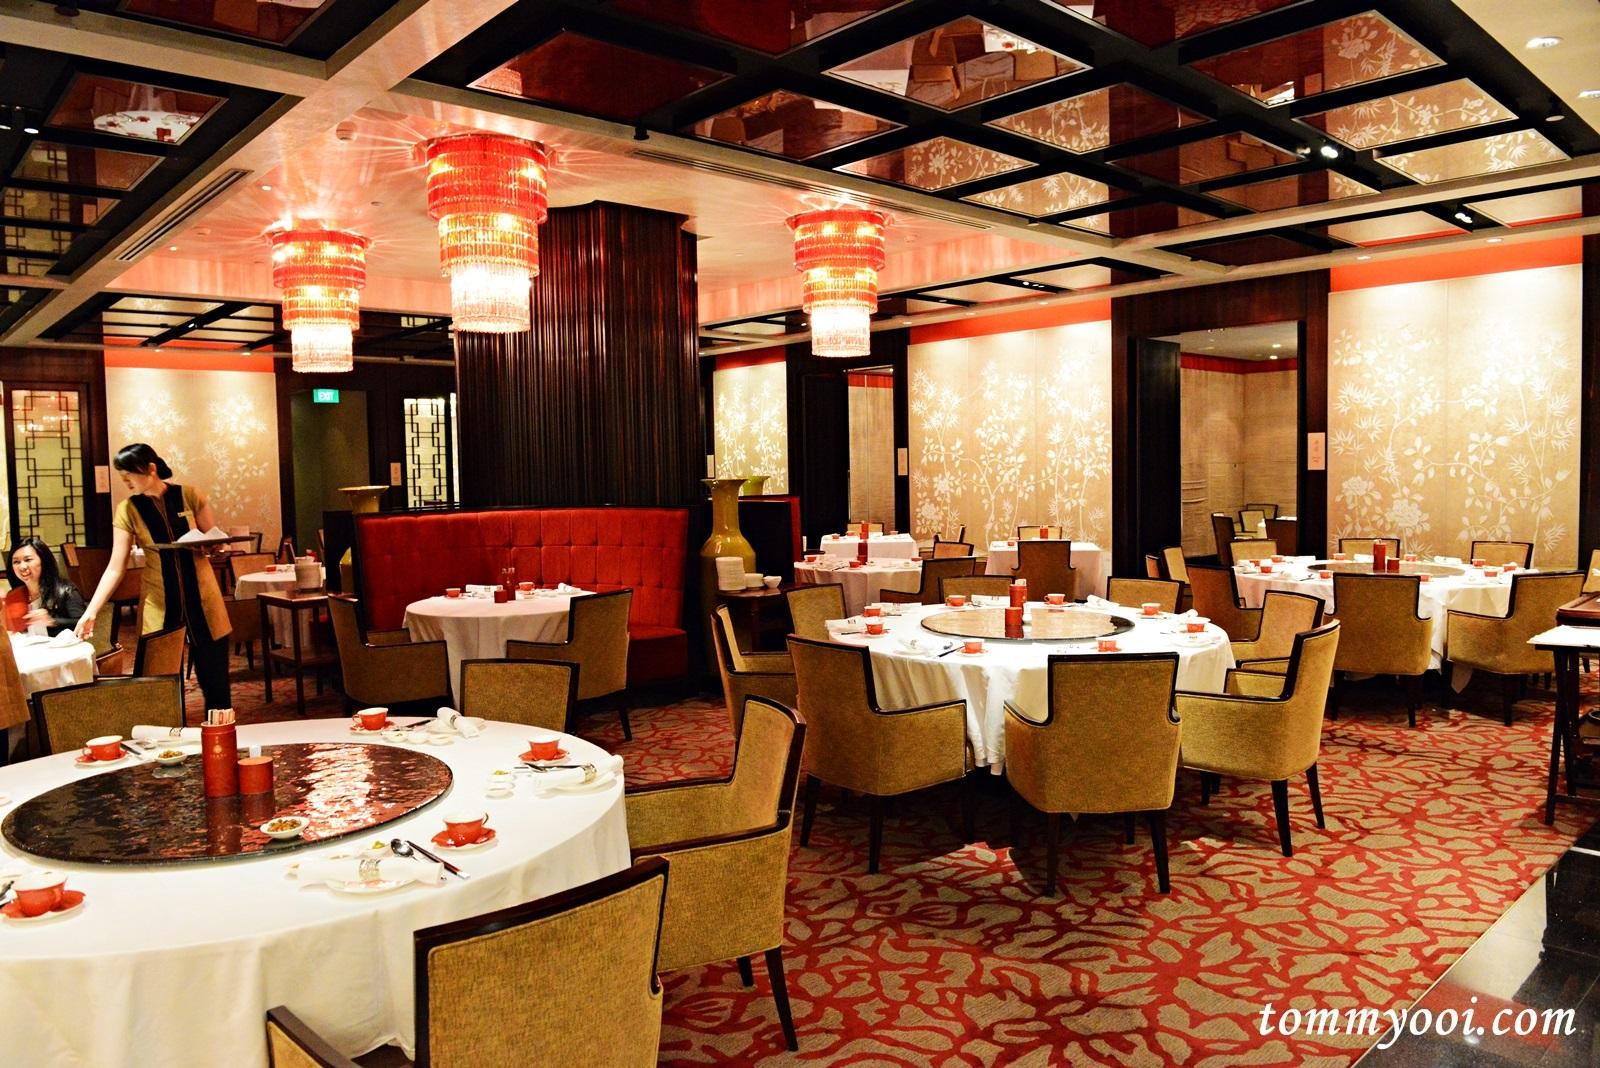 Dim Sum at Shang Palace, Shangri La Singapore - Tommy Ooi